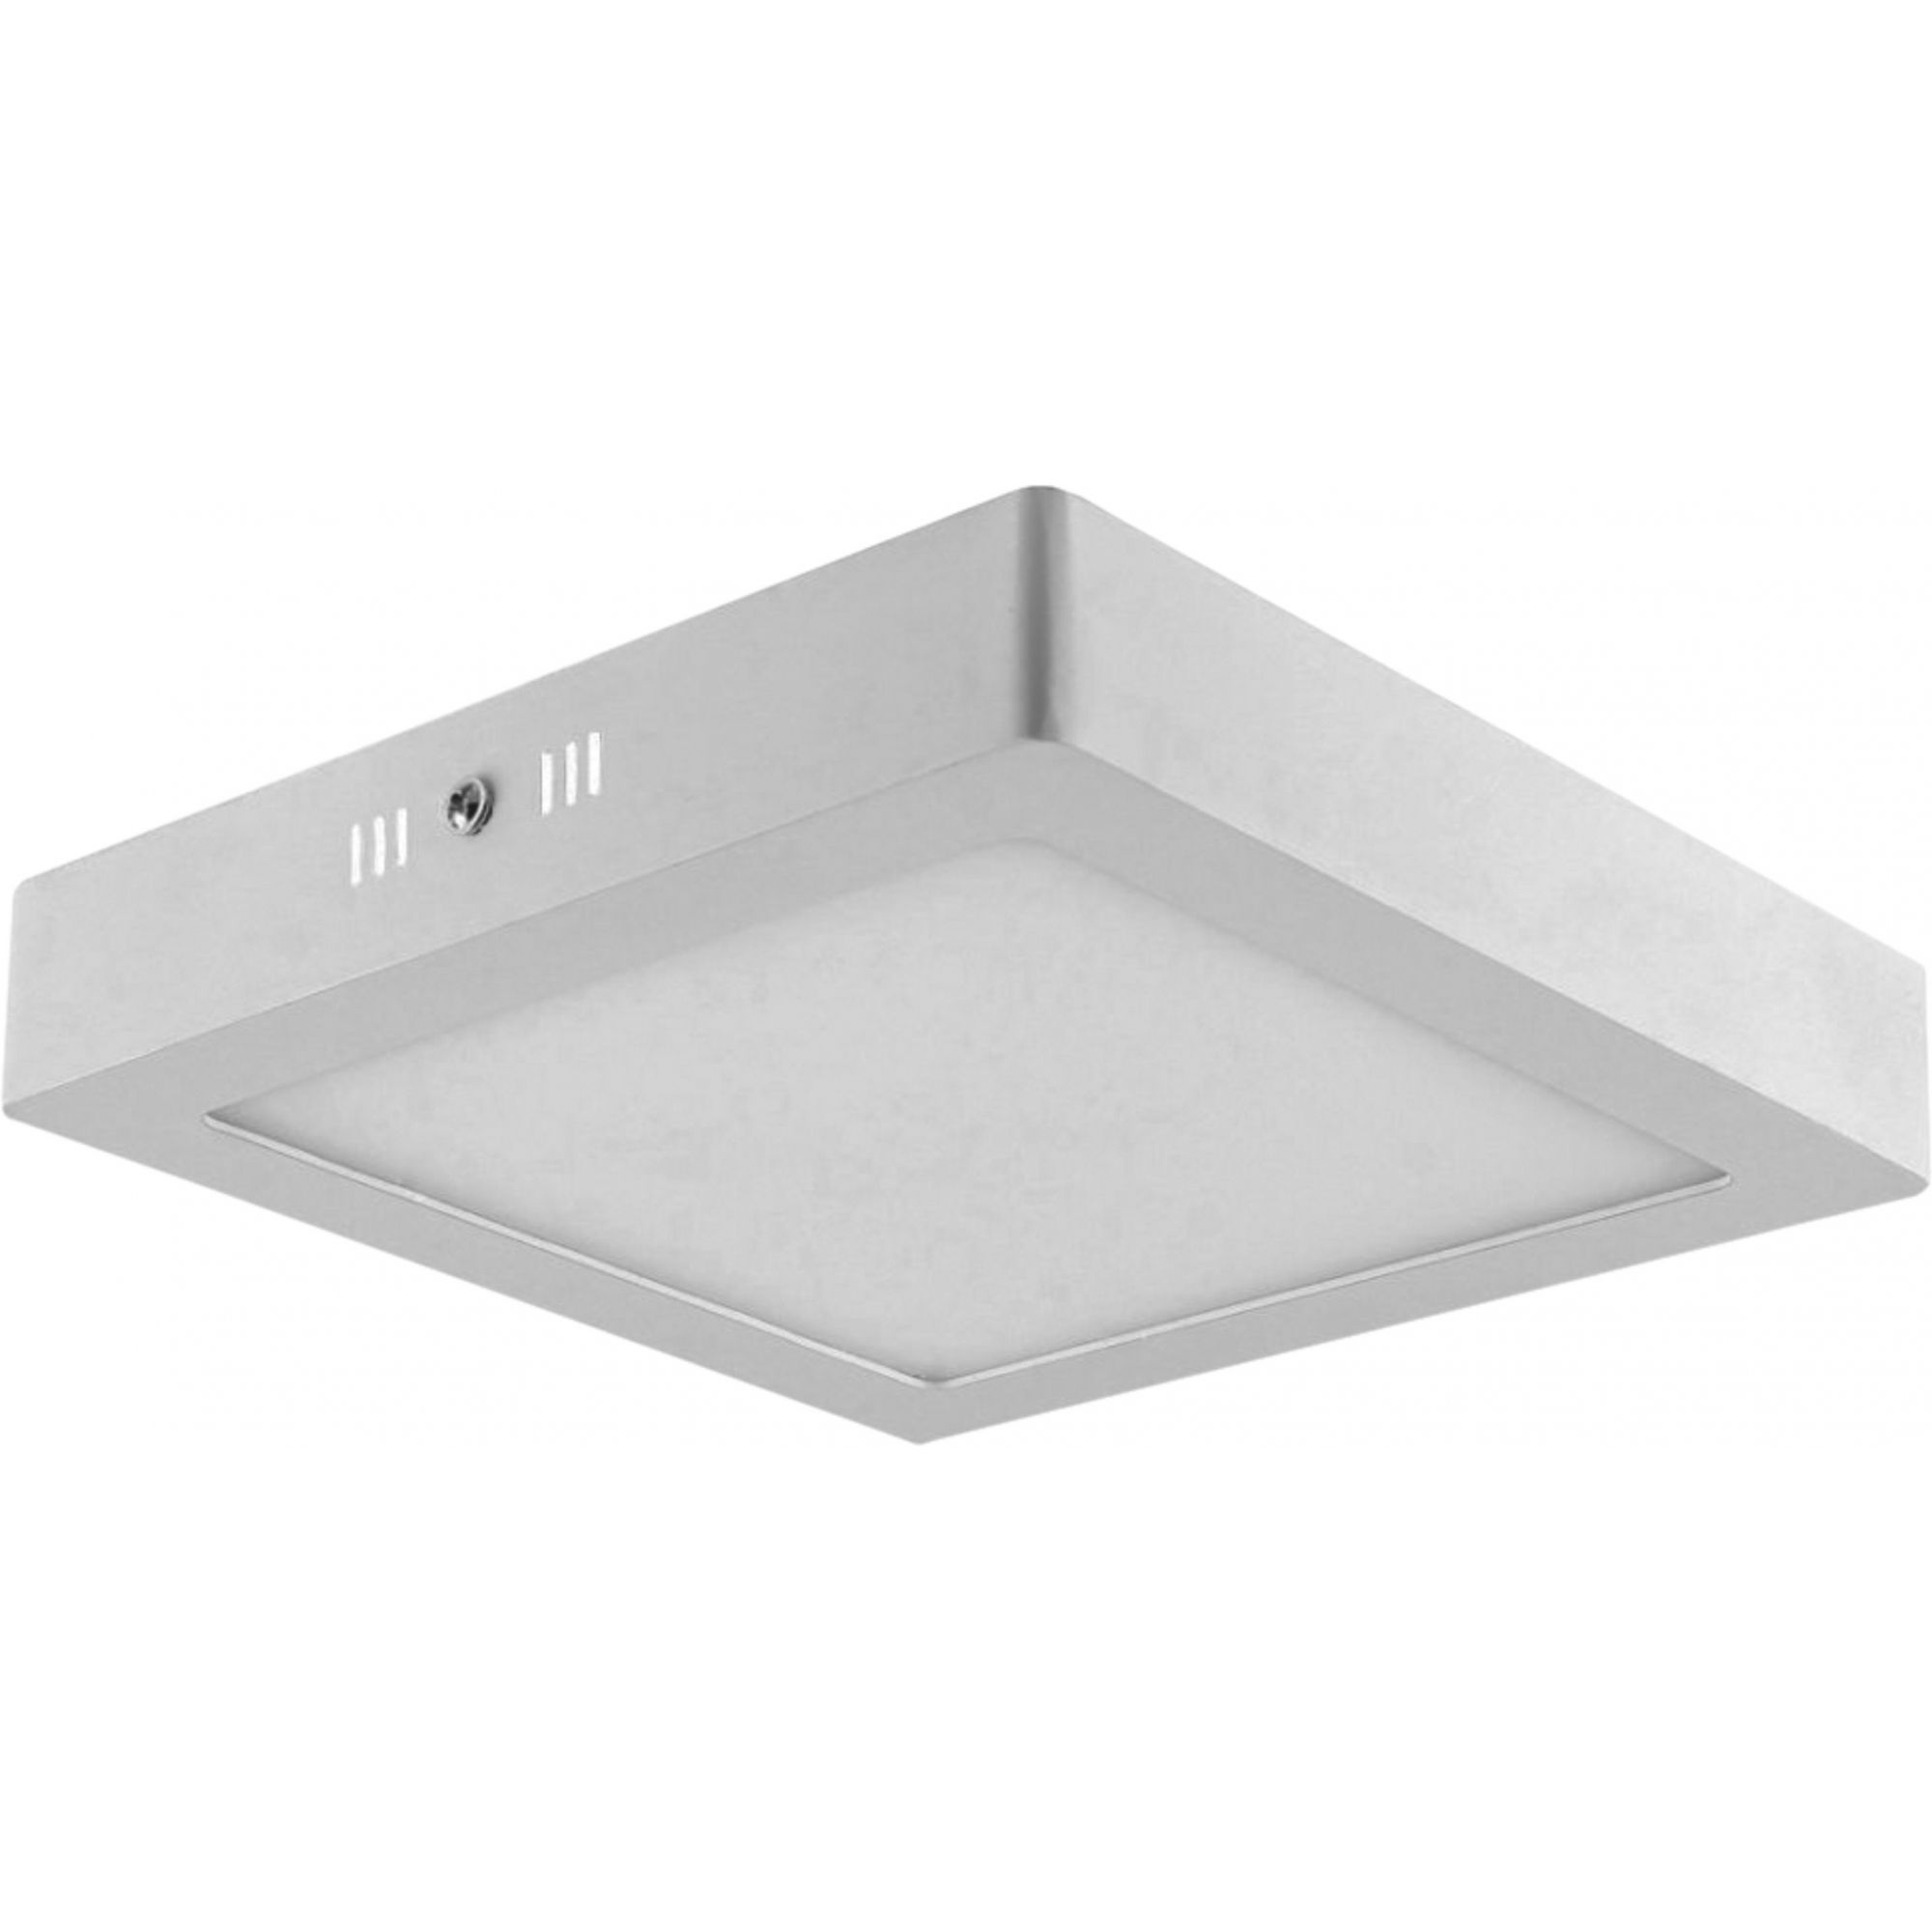 Painel LED Sobrepor 25W 30X30CM Quadrado Bivolt - Branco Neutro 4000K